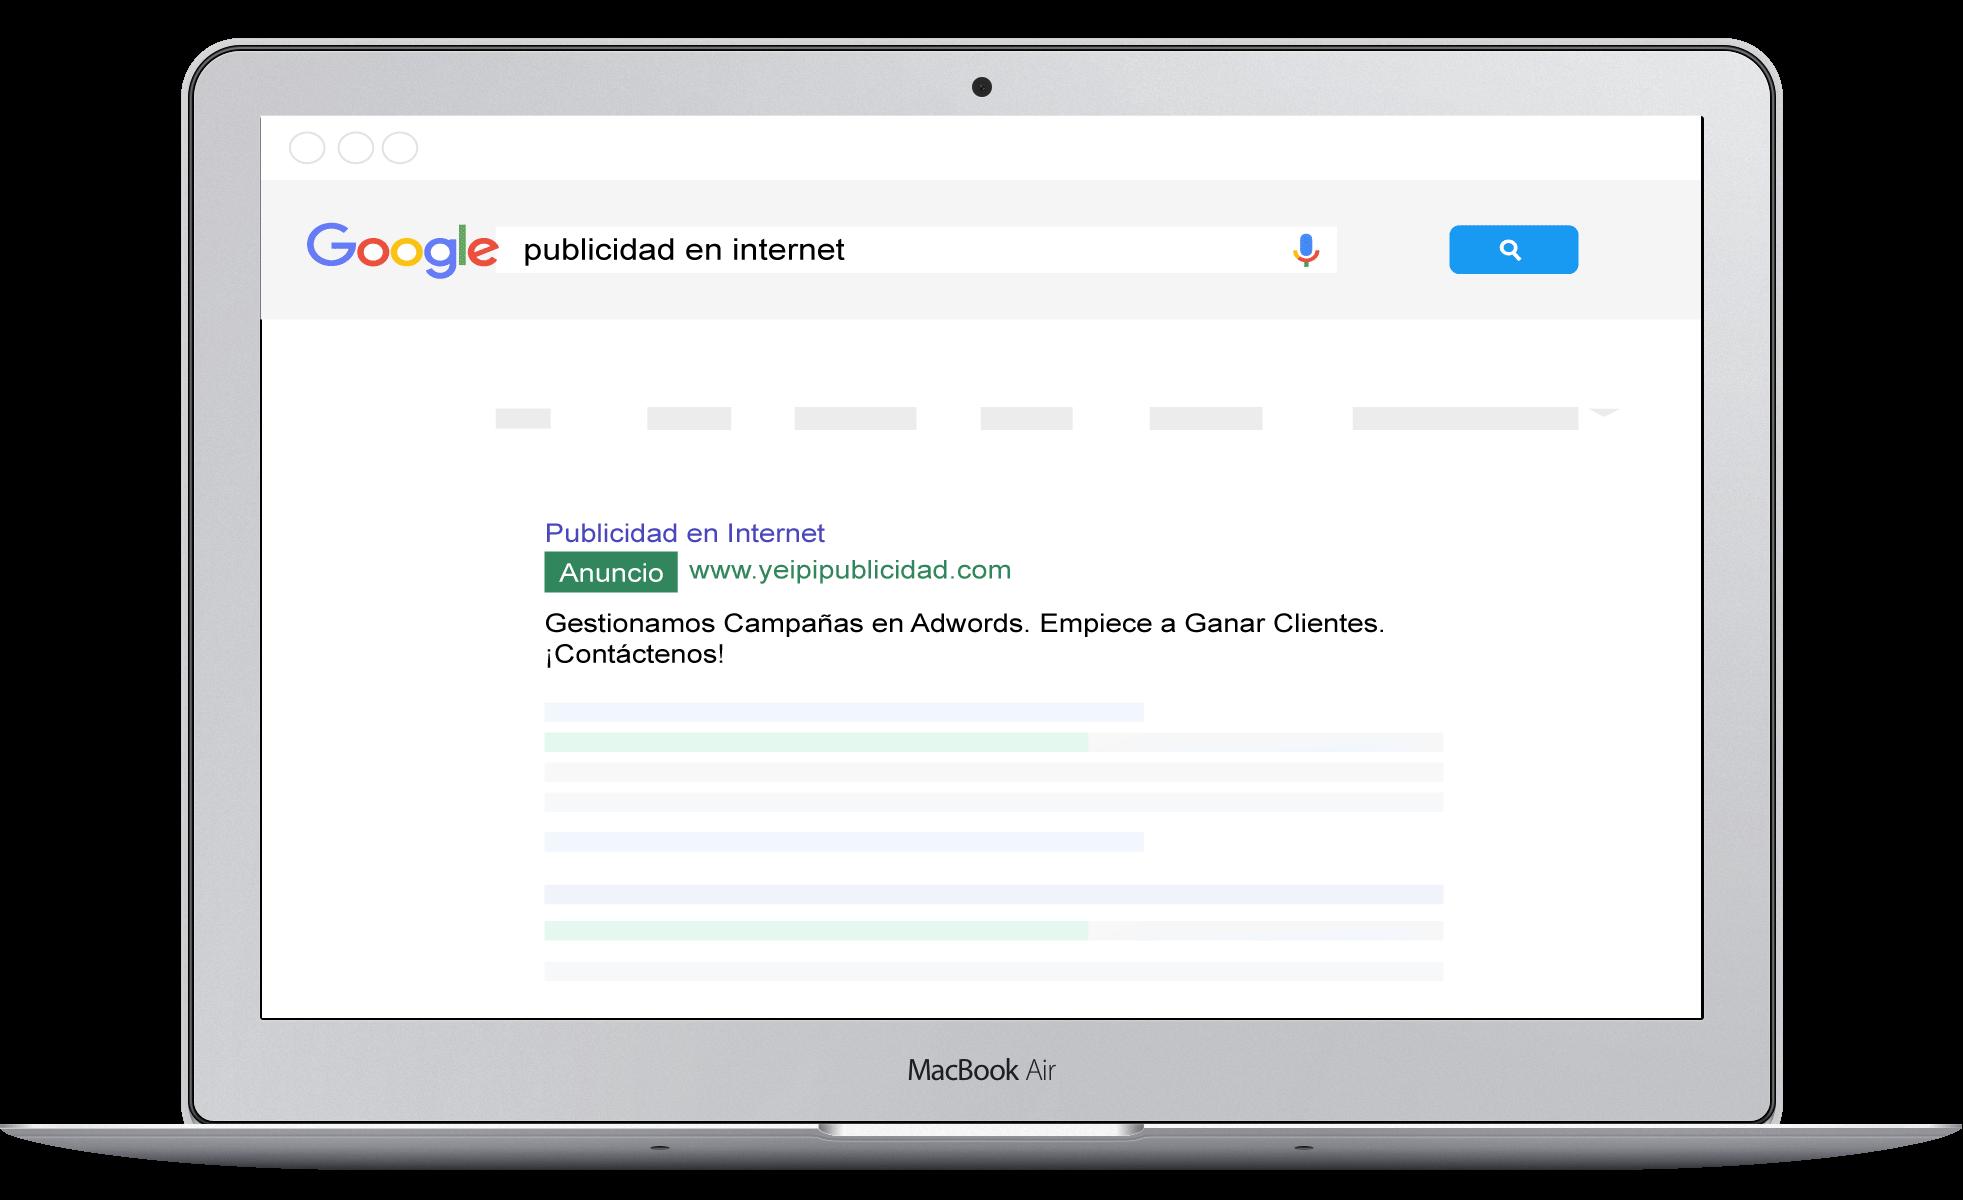 formatos-google-ads-yeipipublicidad